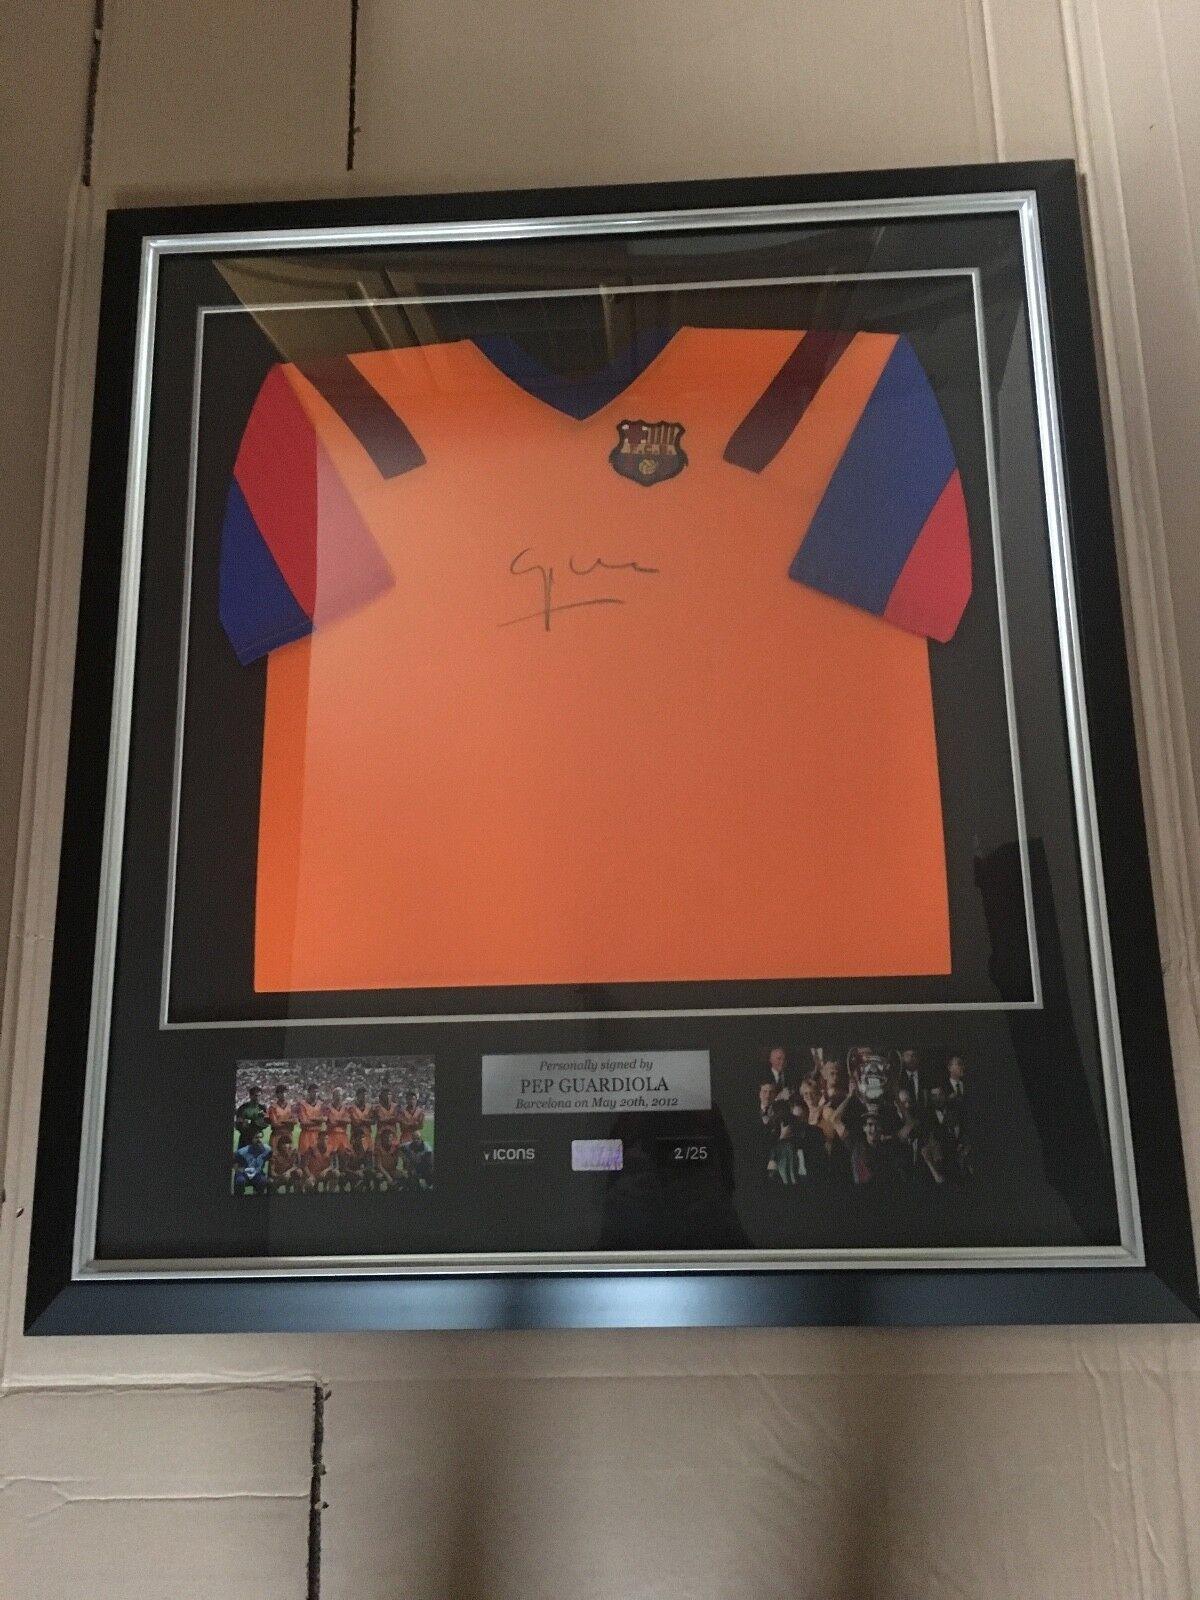 Pep Guardiola © Non-65533C Signed Framed ©65533C Barca Shirt ©